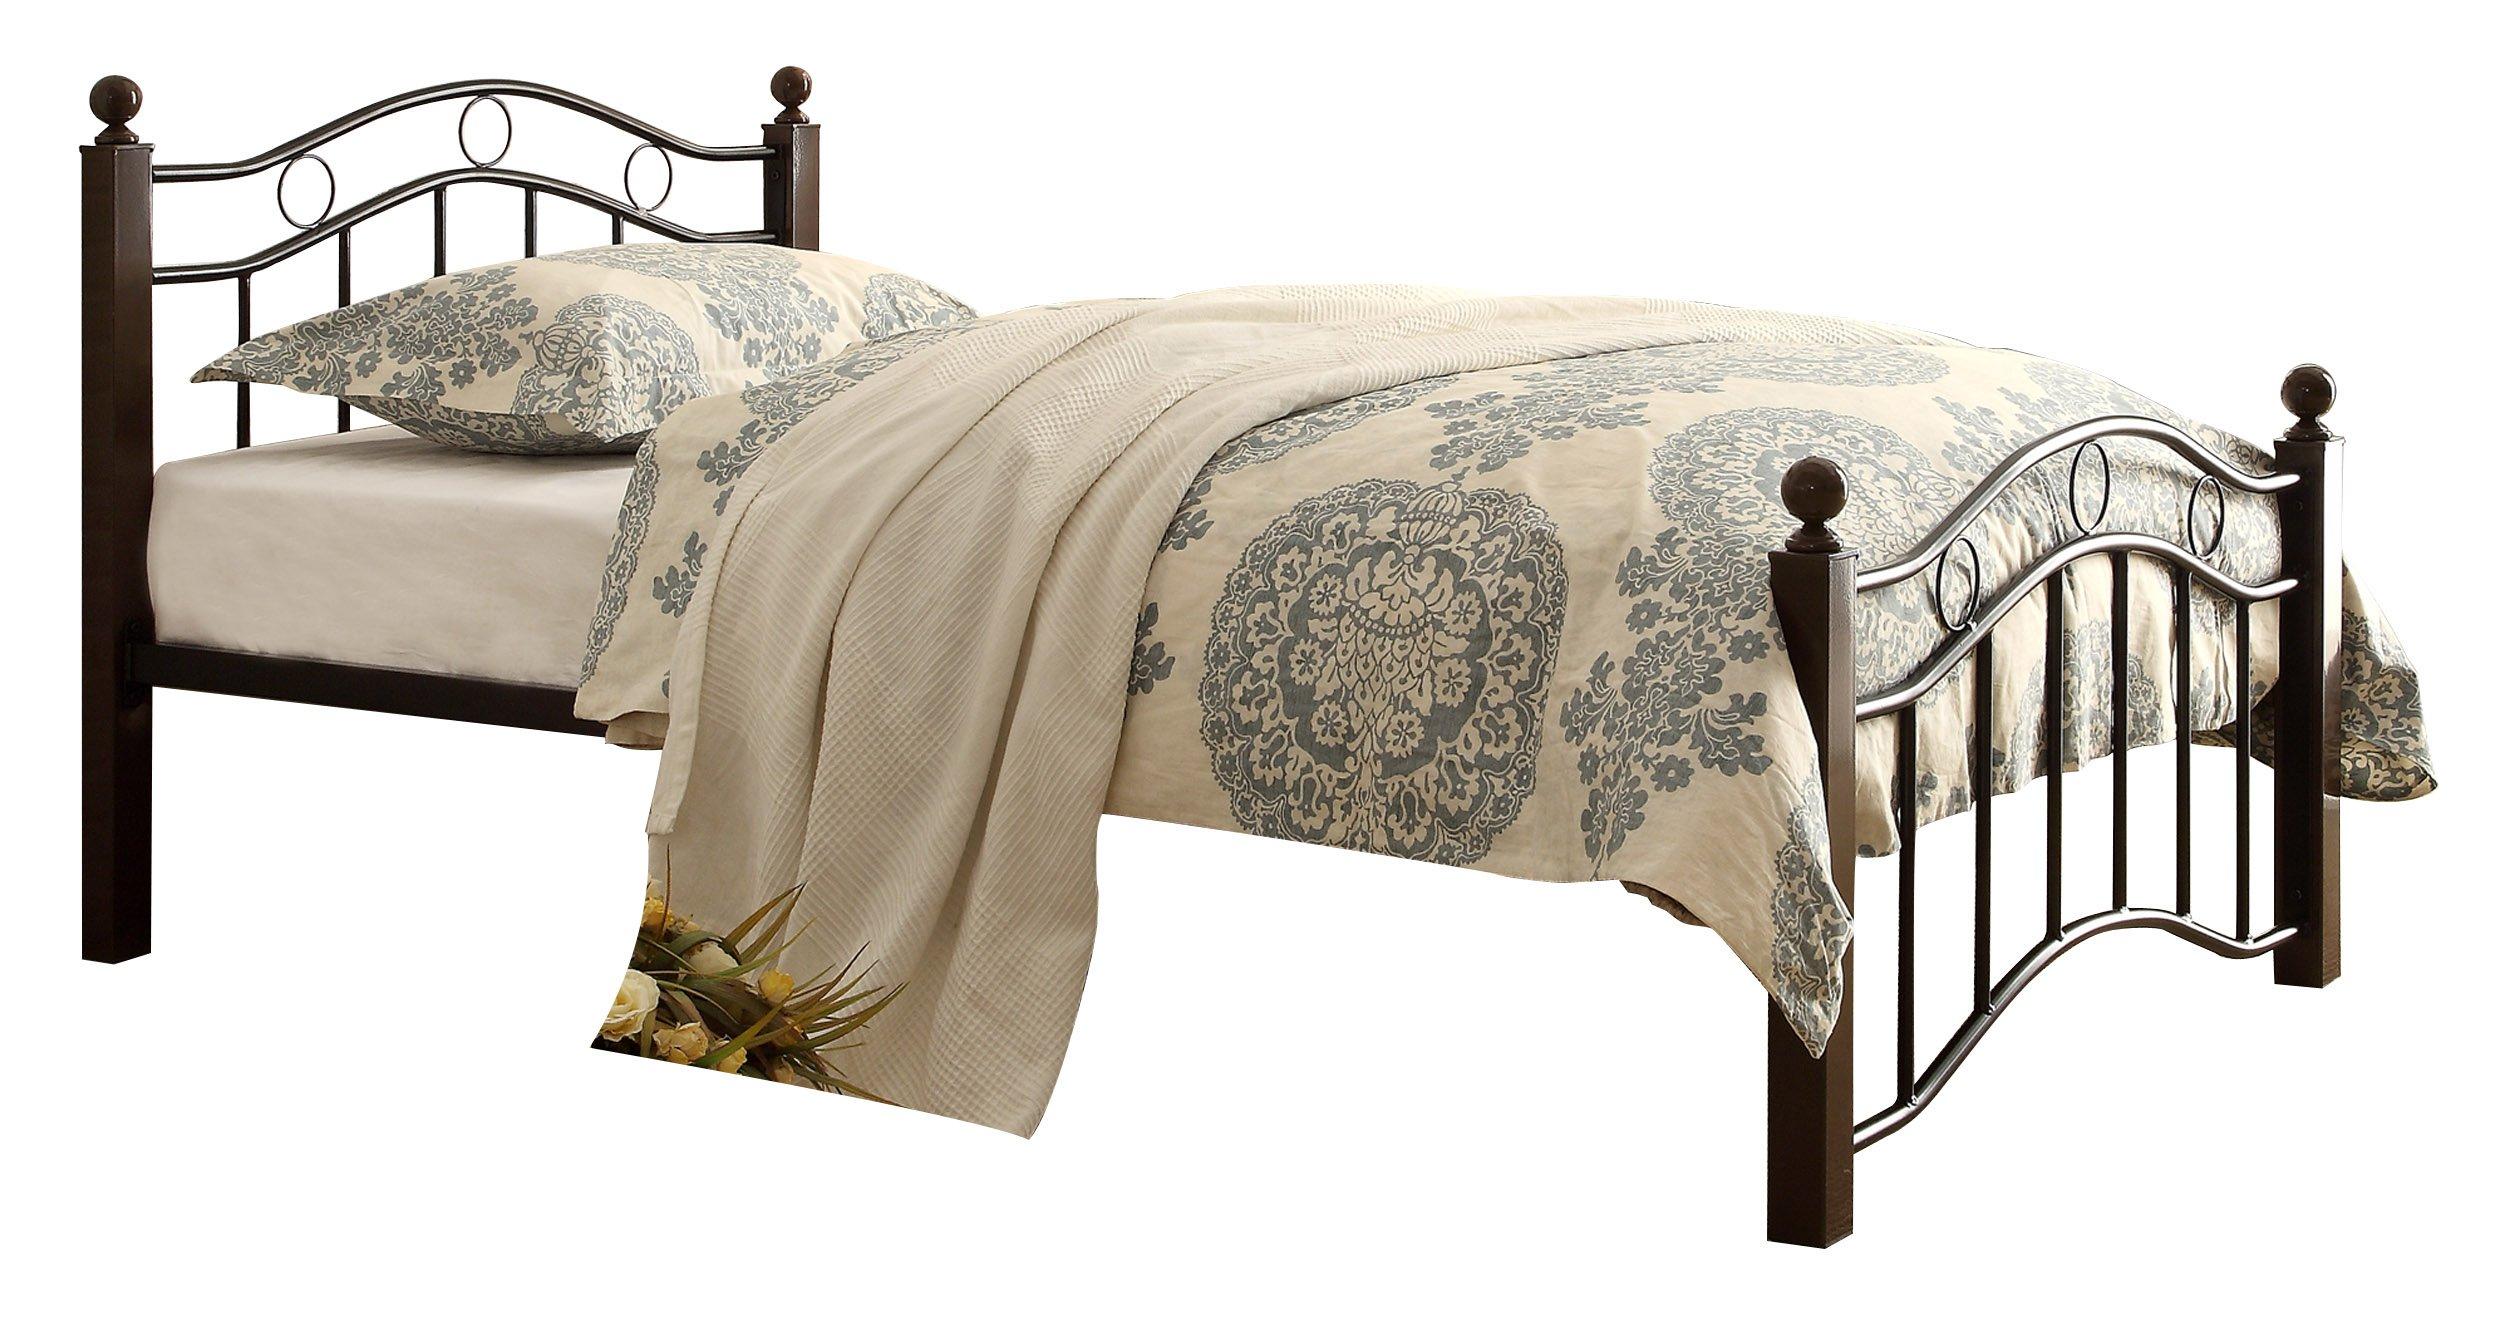 Homelegance Averny Metal Platform Bed, Twin, Black by Homelegance